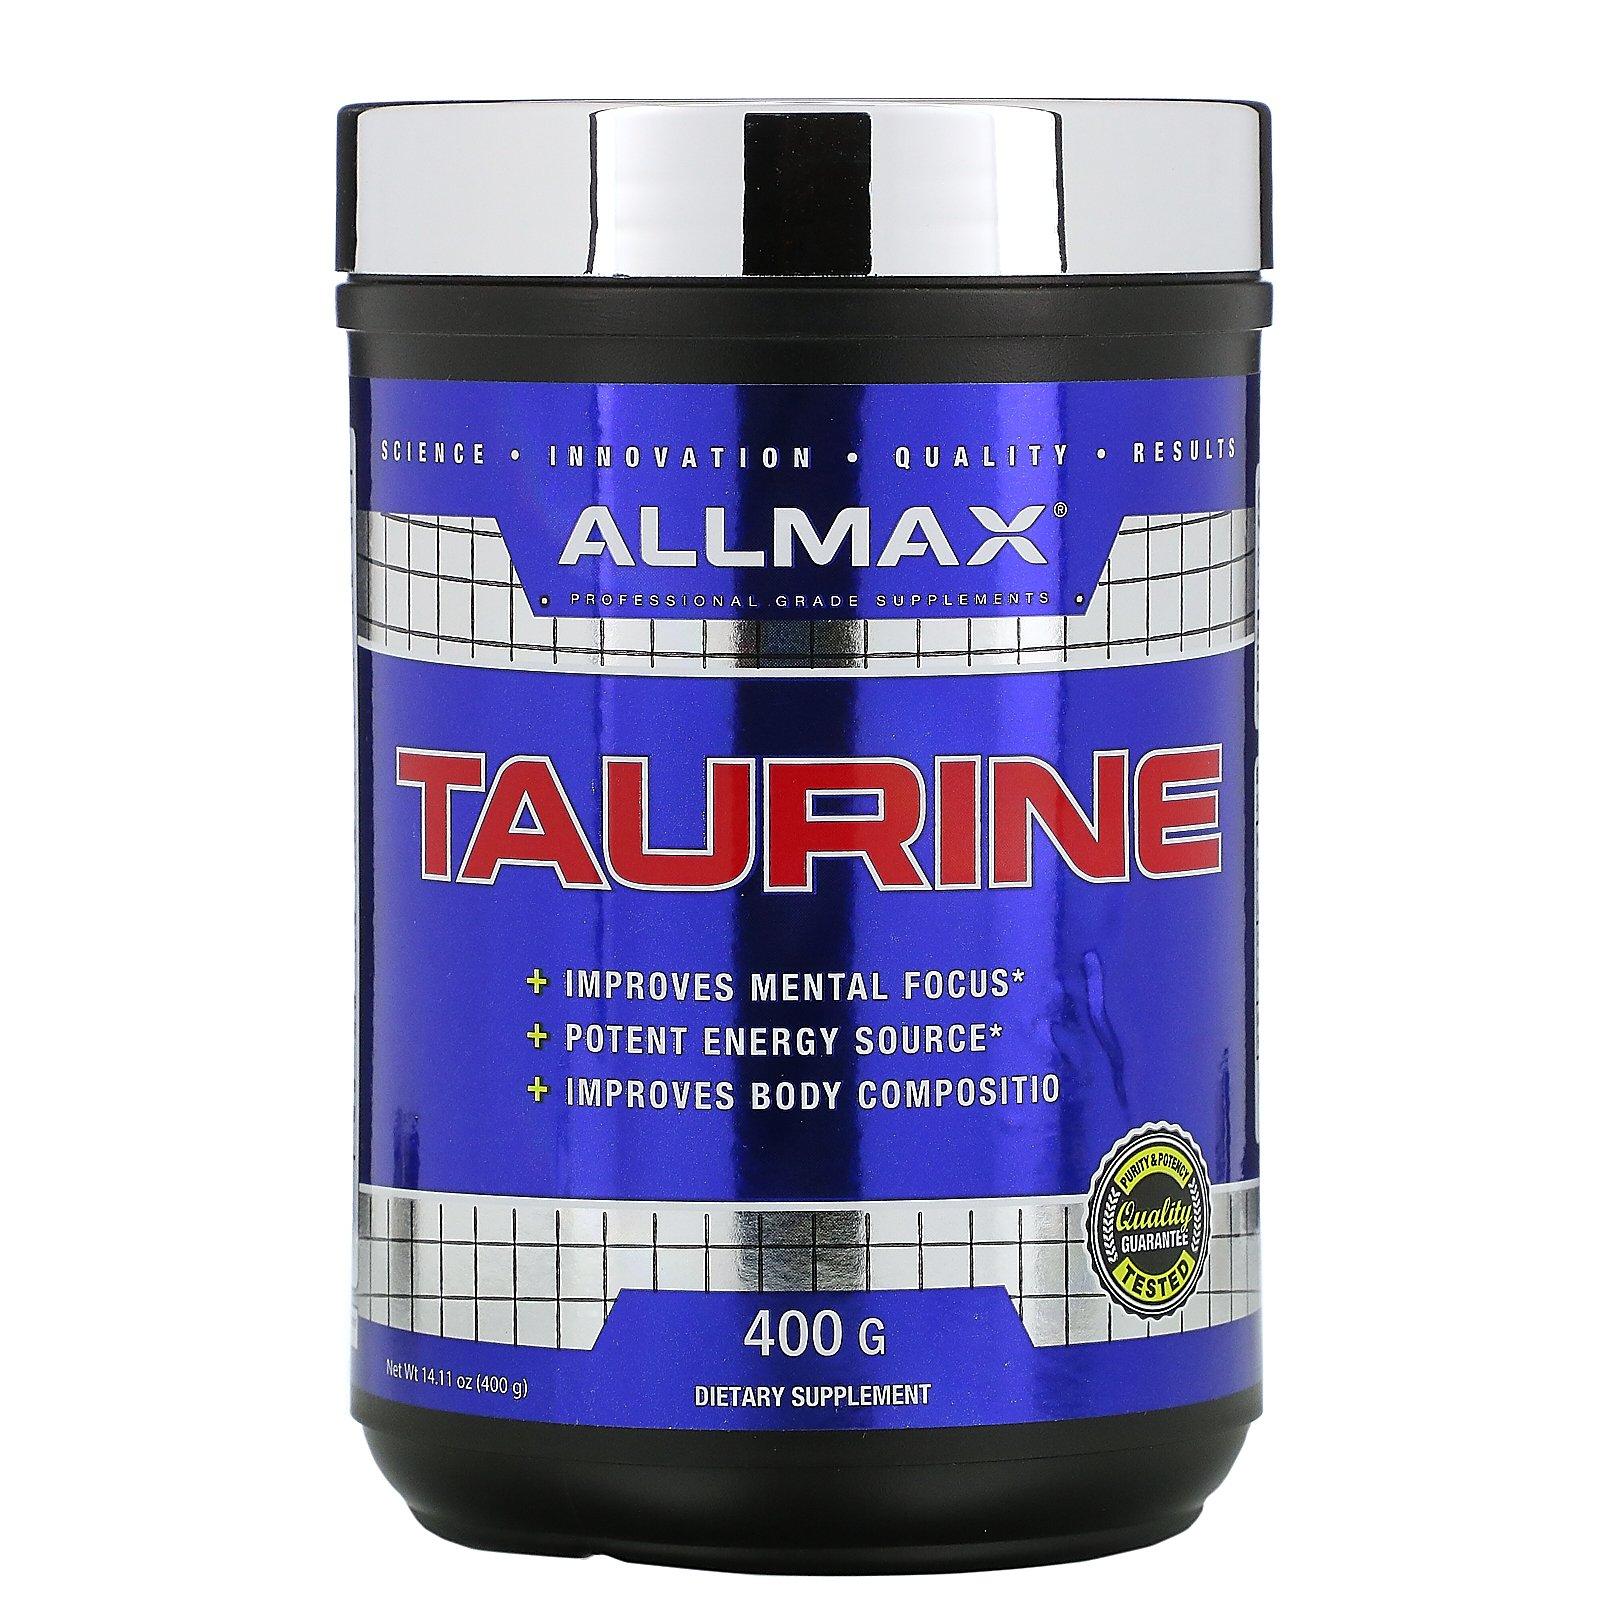 ALLMAX Nutrition, Таурин, без добавок, веганский продукт без глютена, 3000 мг, 400 г (14,11 унций)